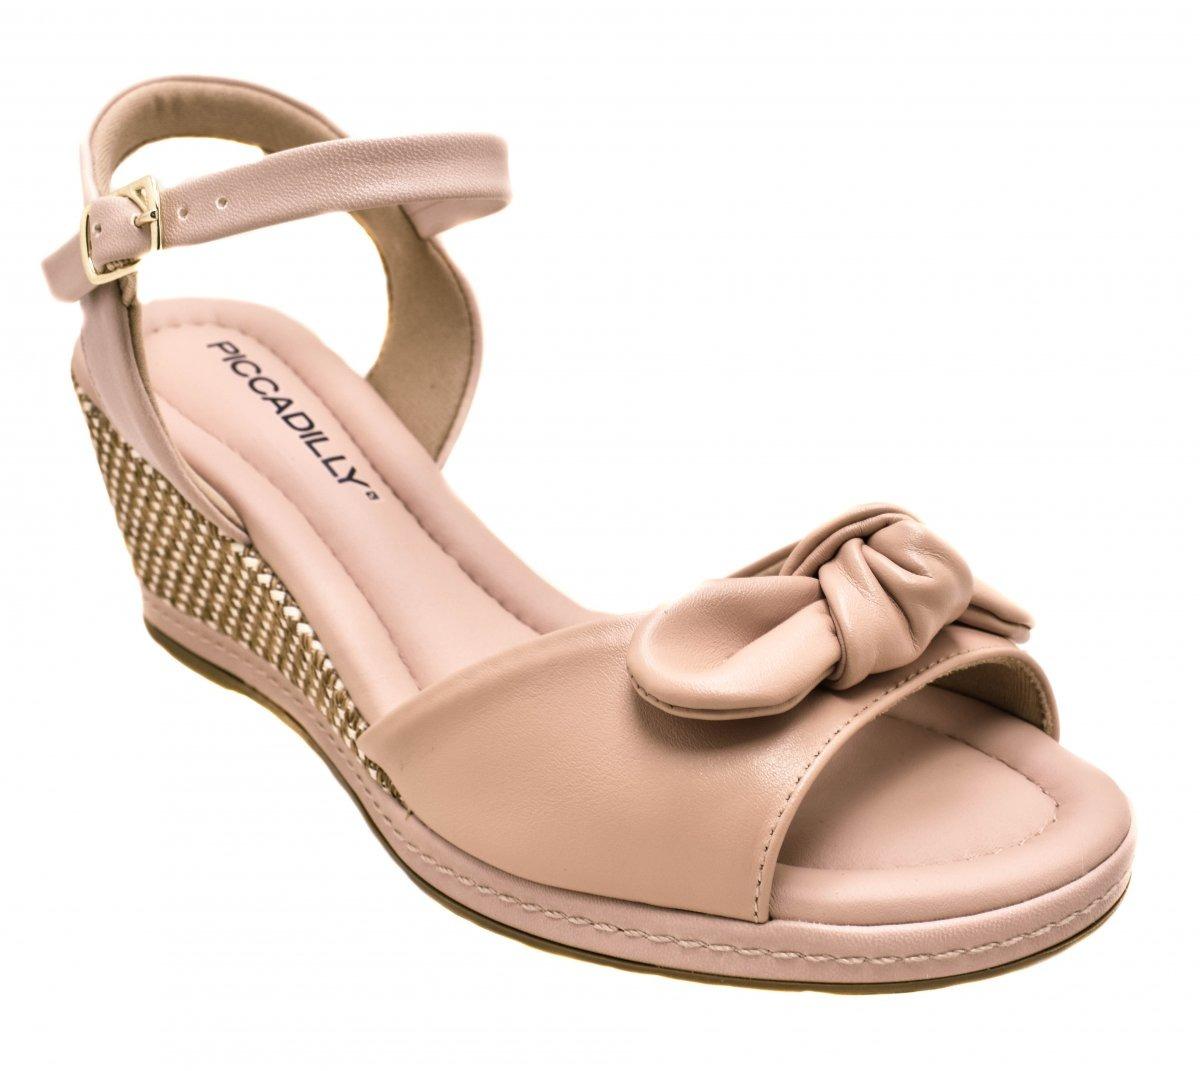 eee515078b sandália anabela piccadilly 408132 joanete - rosa e preto. Carregando zoom.